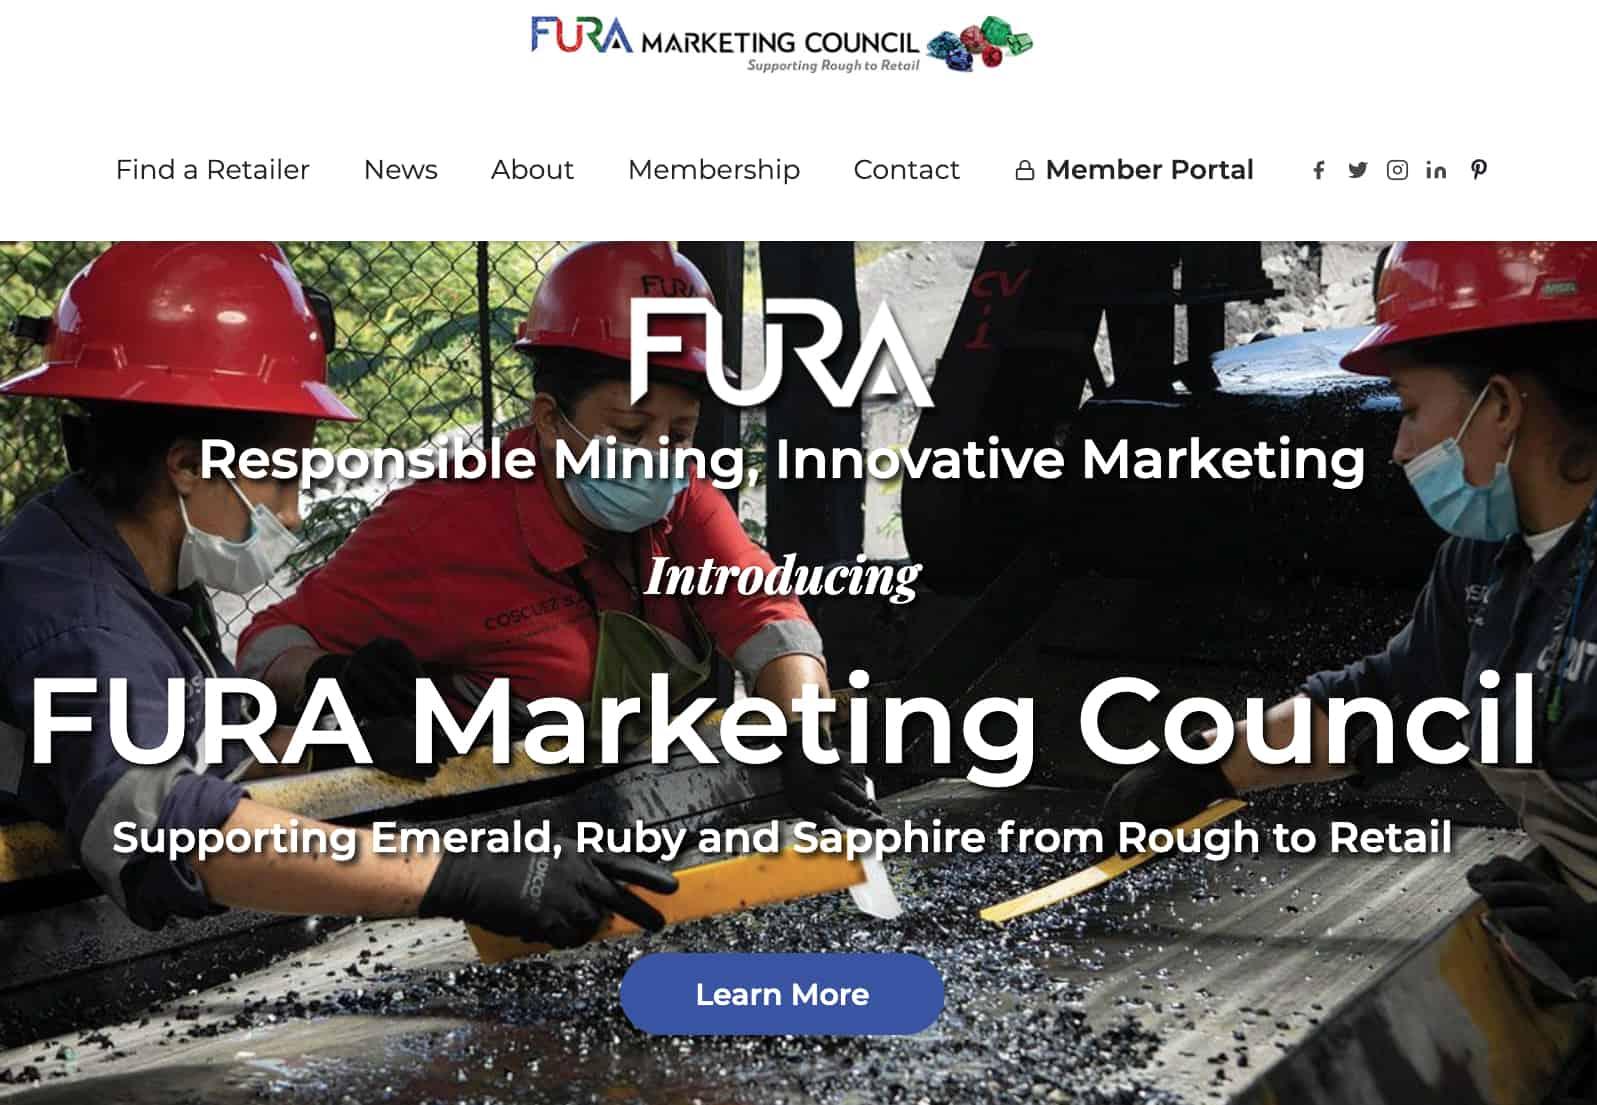 FURA Marketing Council